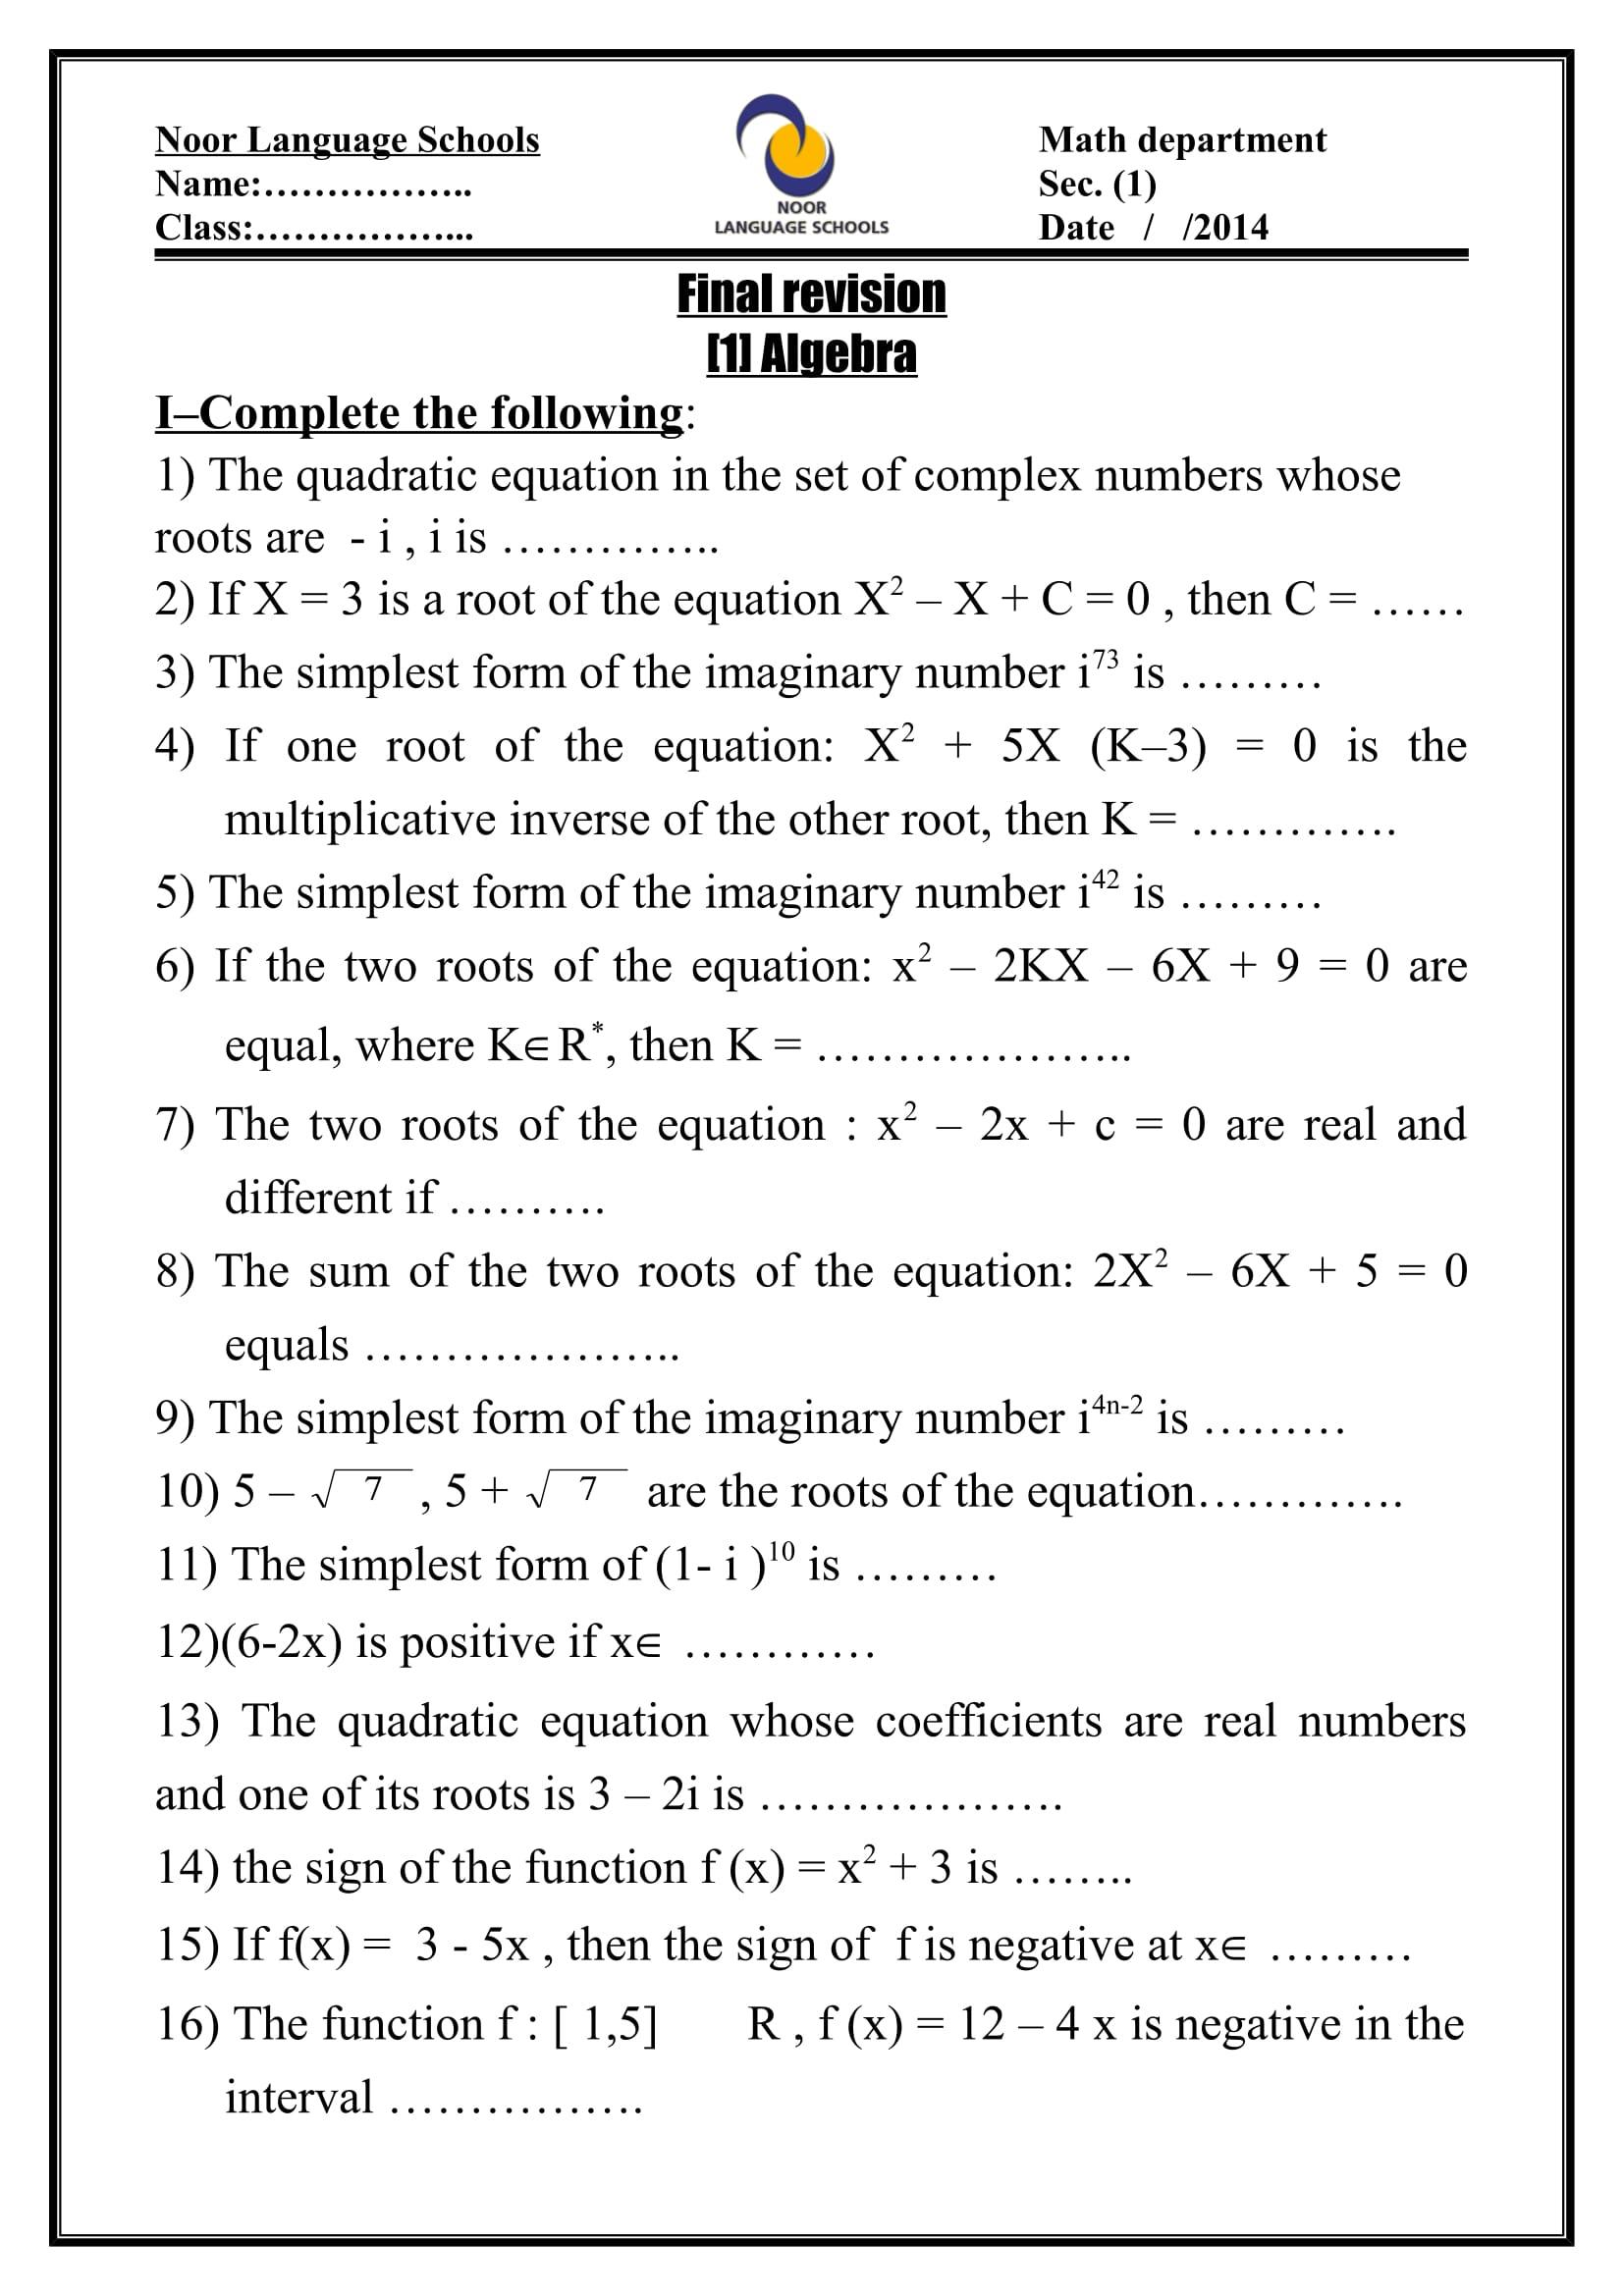 exam-eg.com_1511270253971.jpg